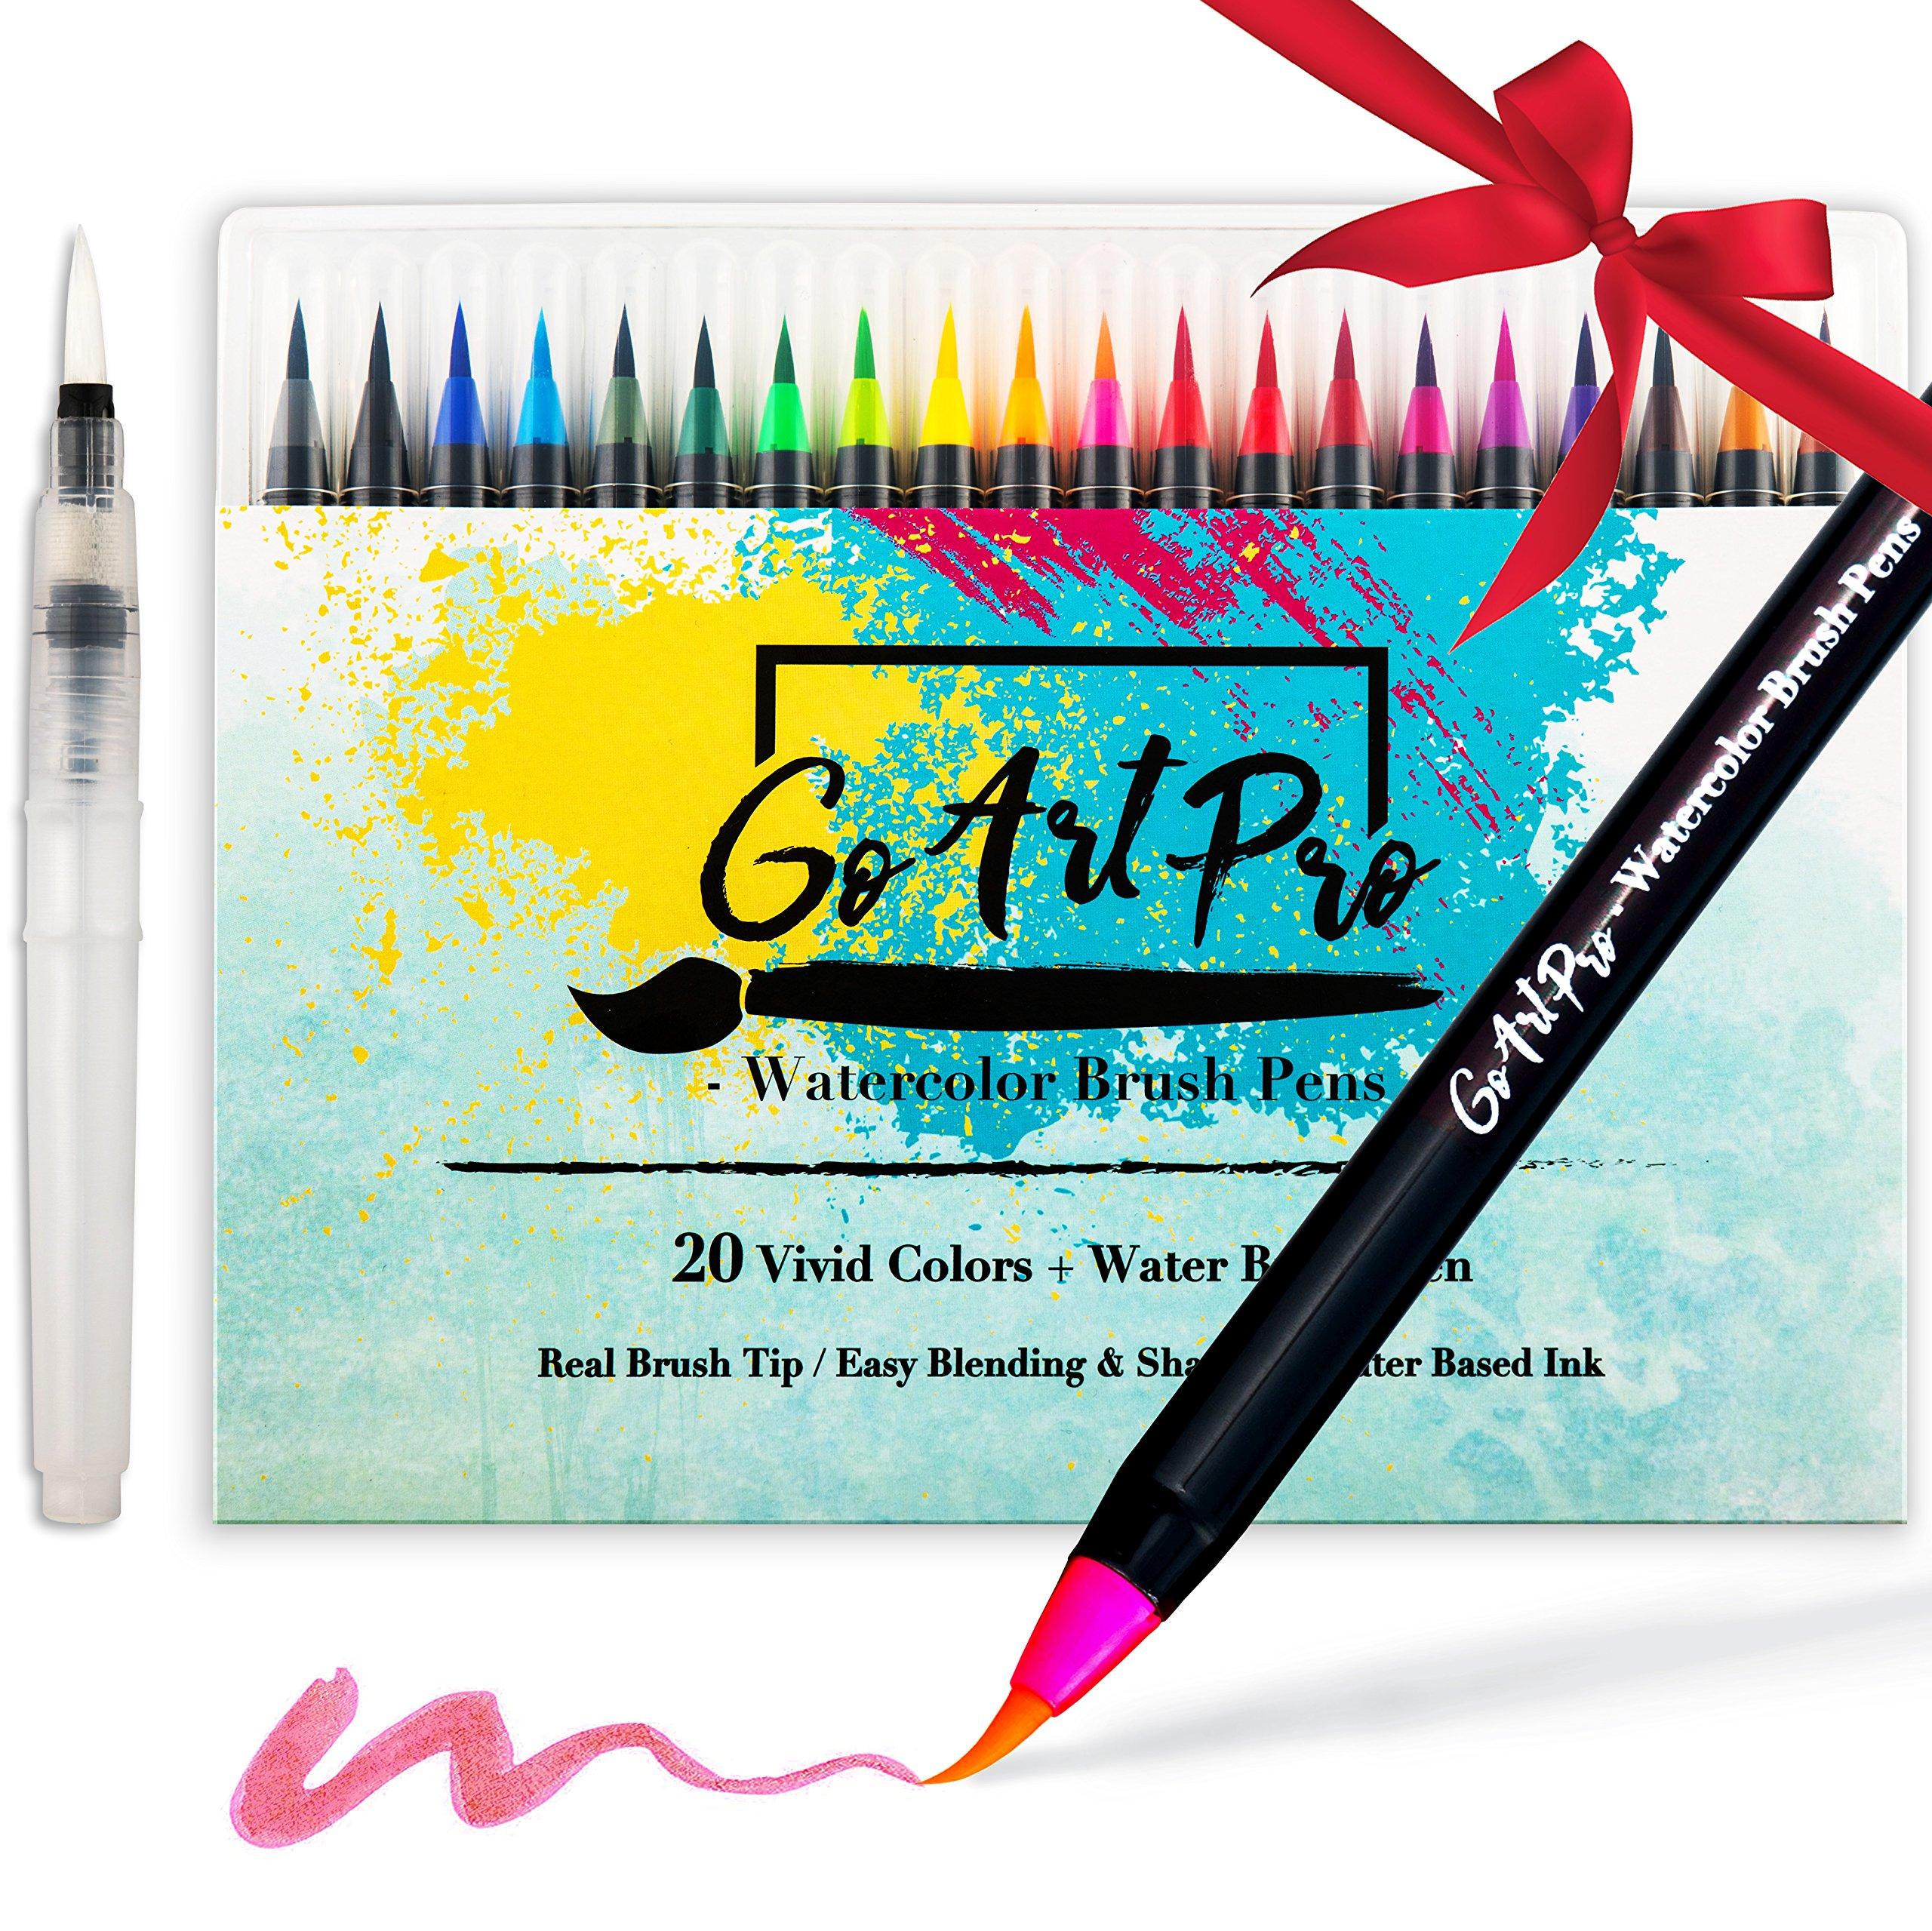 Watercolor Brush Pens by GoArtPro   Set of 20 Color Soft Flexible Real Brush Pens + BONUS Watercolor Pen   Brush Tip Markers for Adult Coloring Books, Manga, Comic, Calligraphy